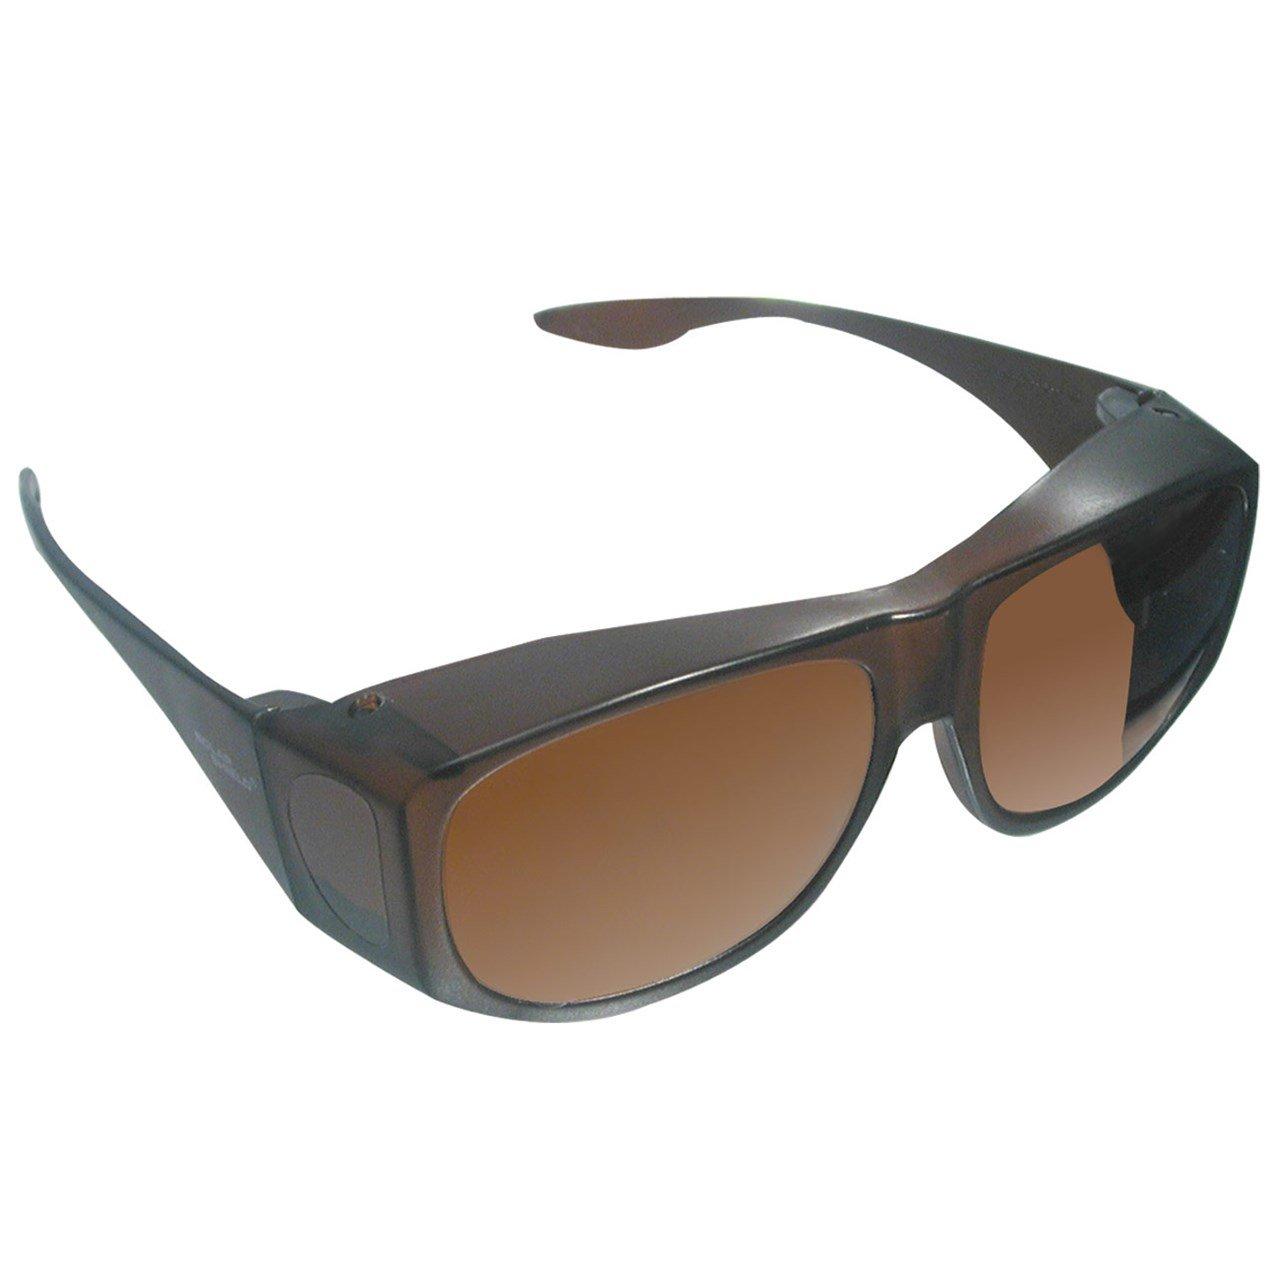 8db0341d95b28 Amazon.com  Solar Shields™ - Smoke  Beauty